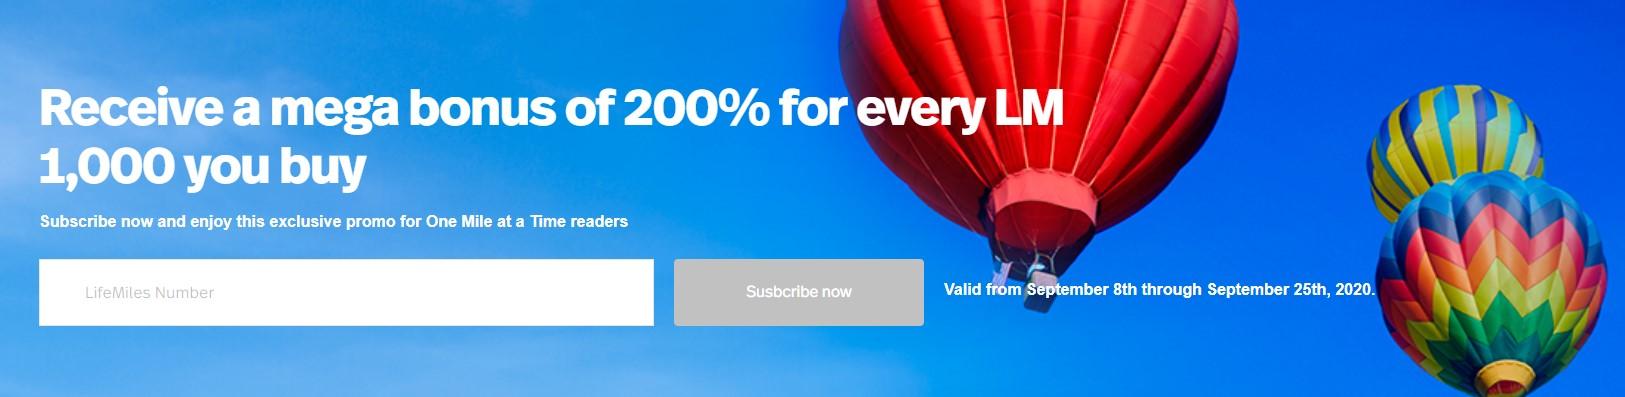 [Последний шанс] Распродажа миль LifeMiles с WOW-бонусом 200%